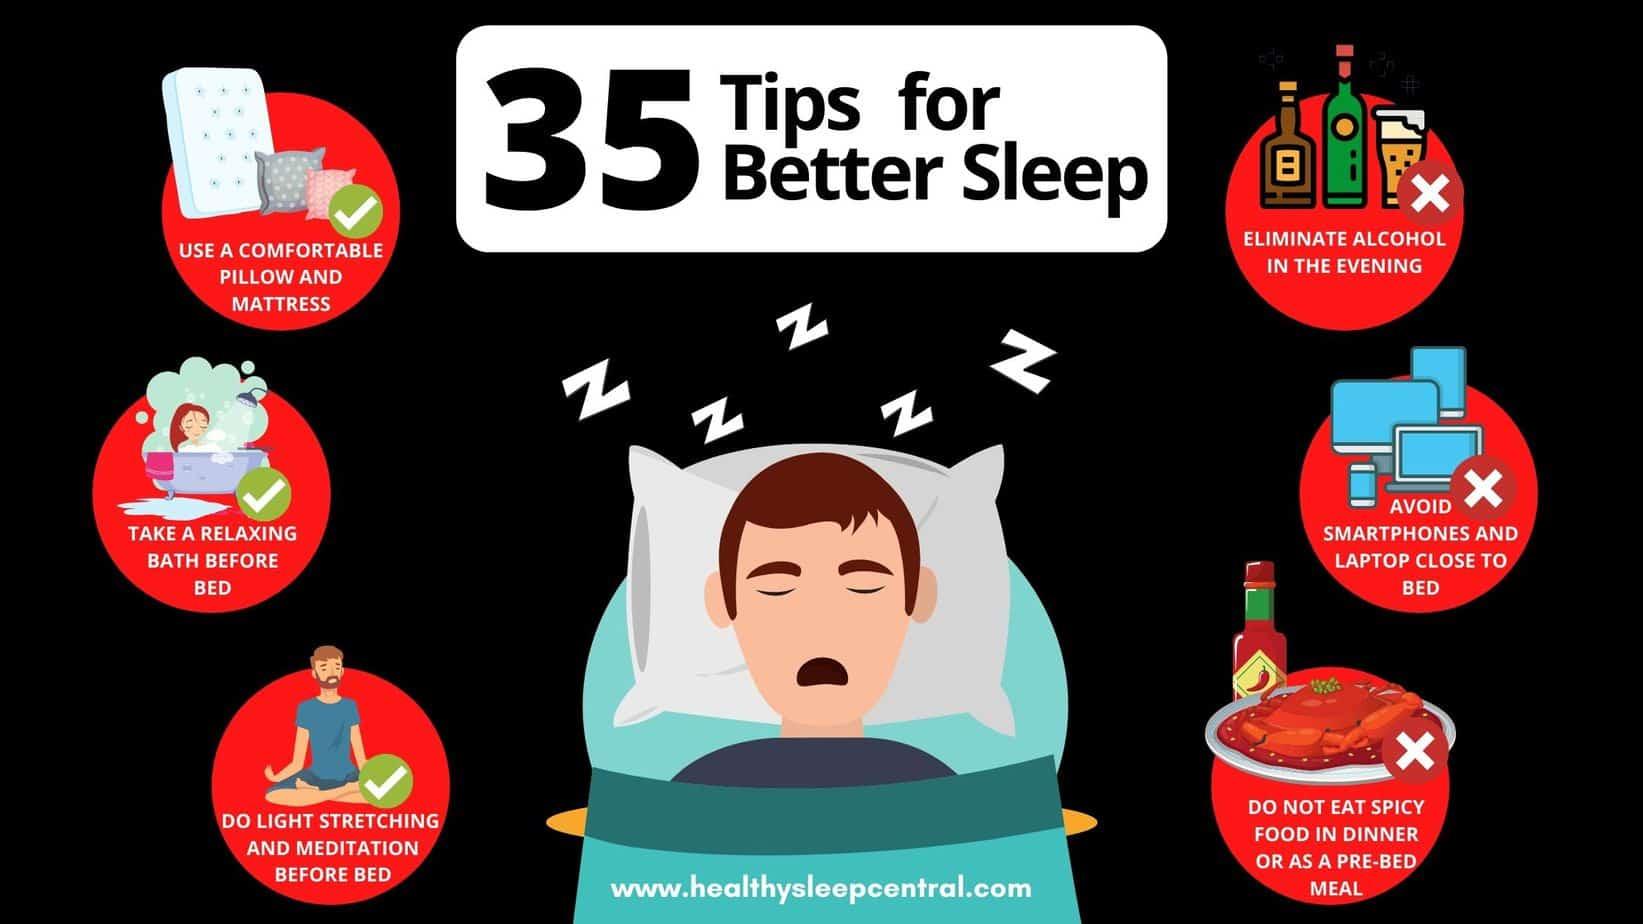 35 tips for better sleep By Healthy Sleep Central